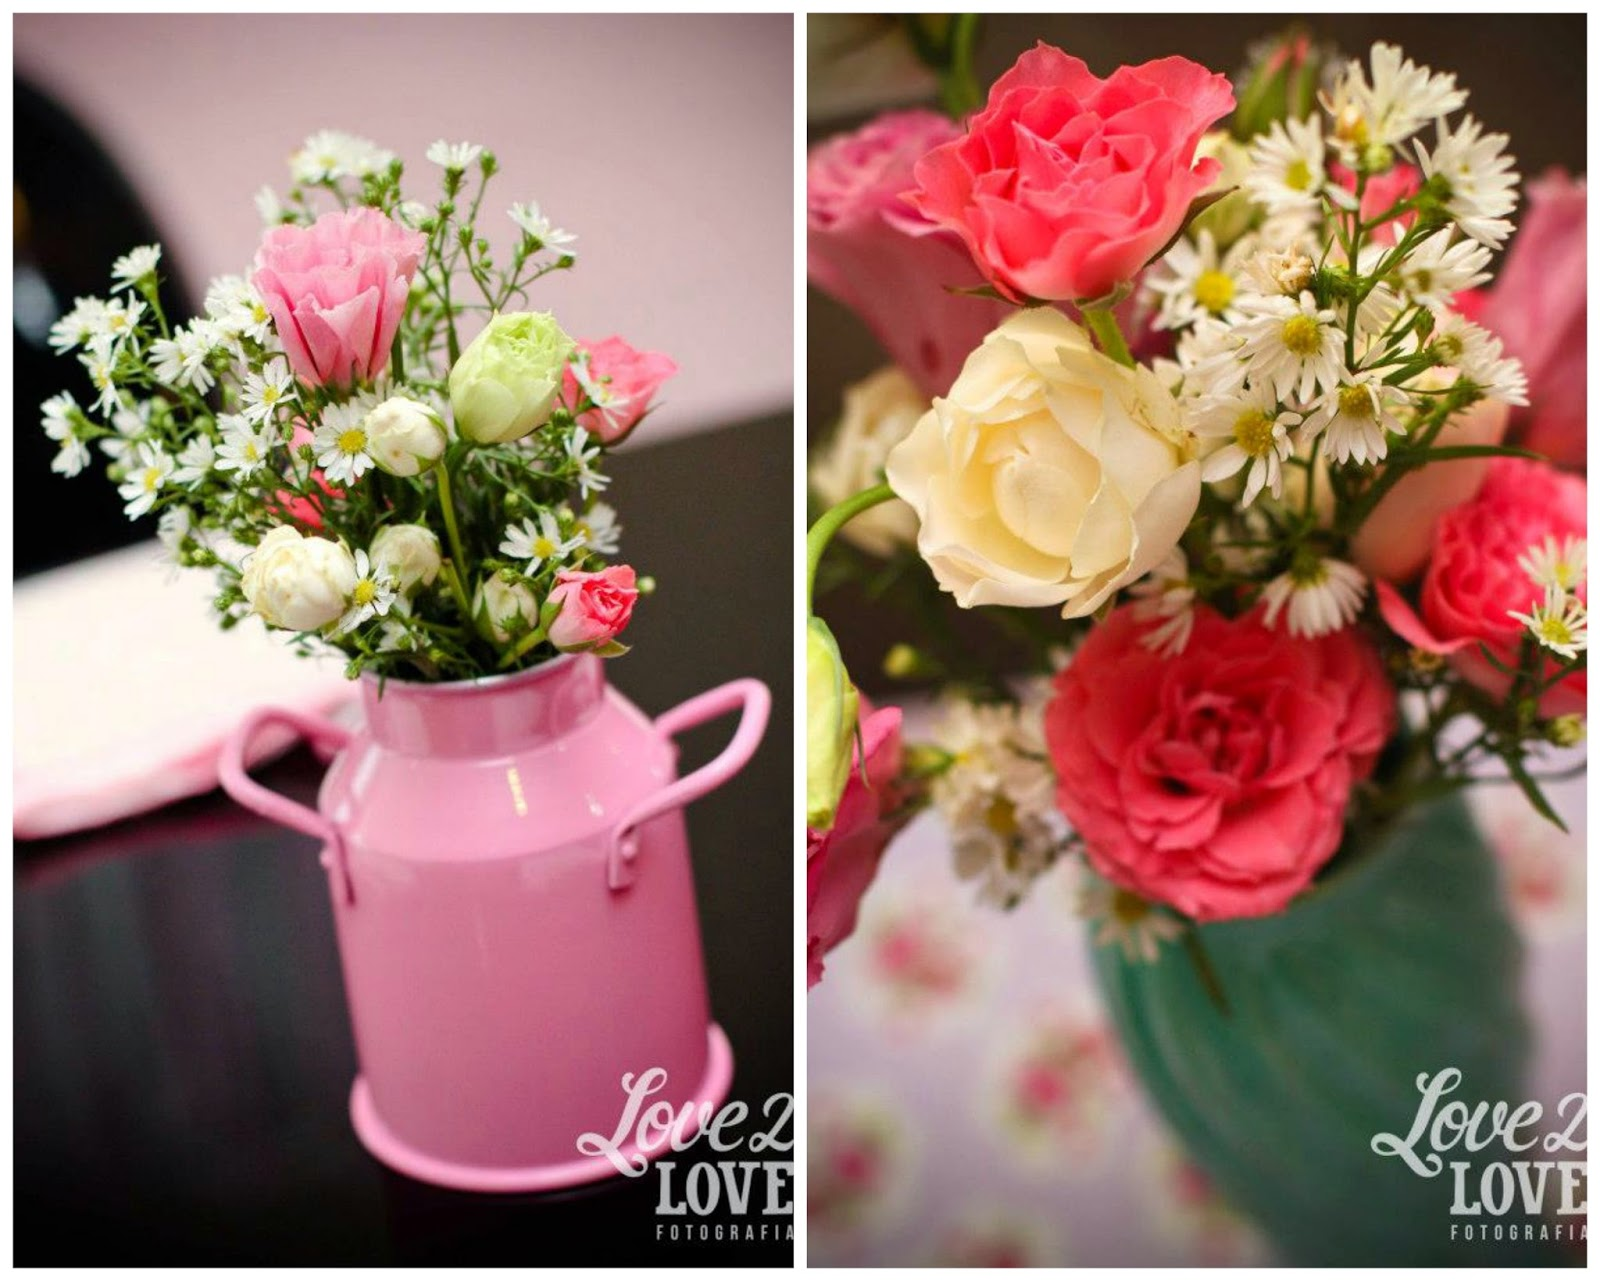 cha-panela-rosa-verde-flores-1